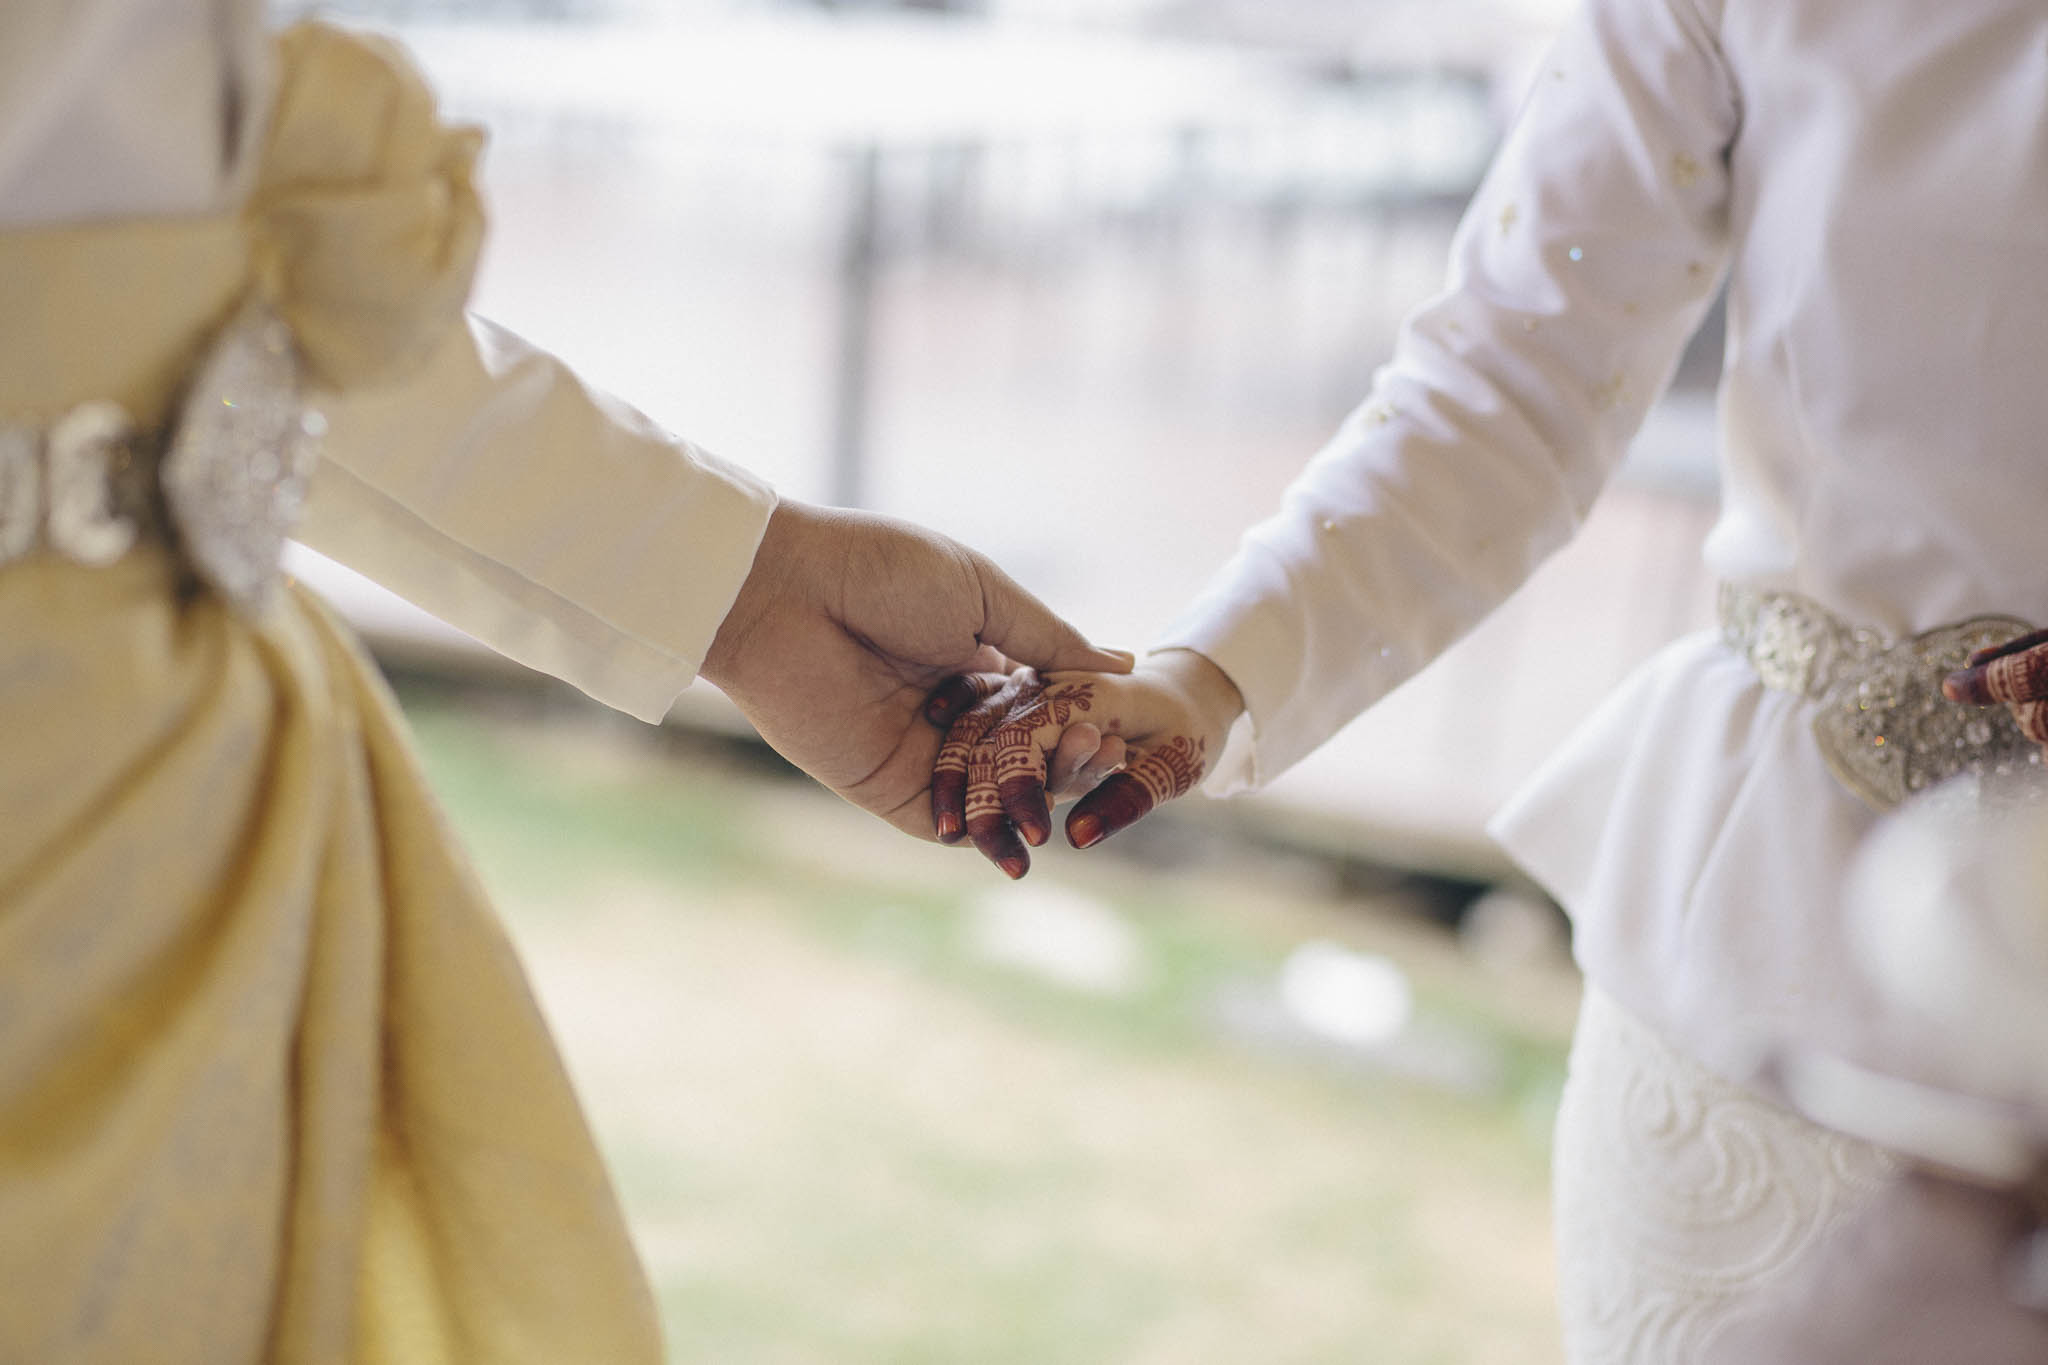 singapore-wedding-photographer-travel-khairul-atikah-68.jpg